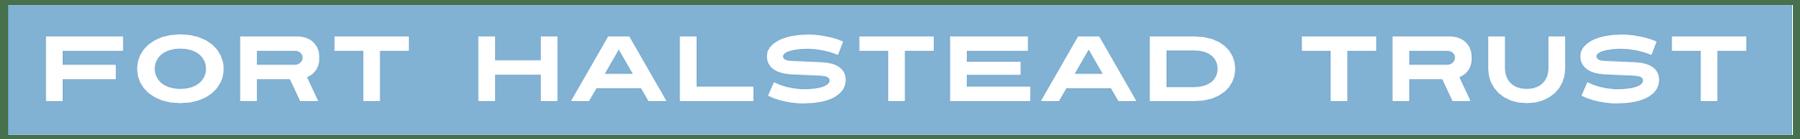 Fort Halstead Trust